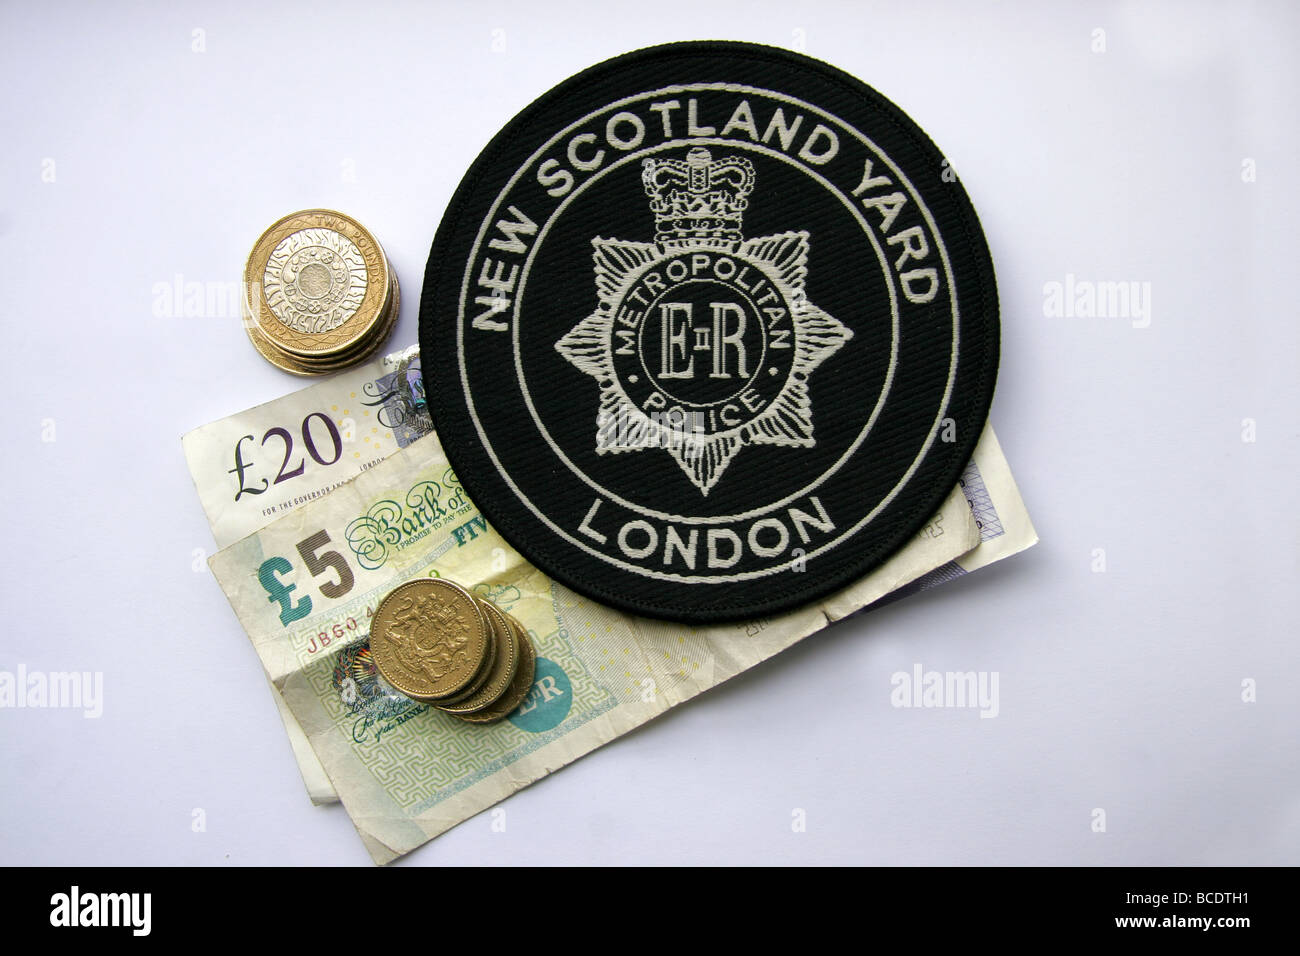 London Metropolitan Police New Scotland Yard patch and British money - Stock Image